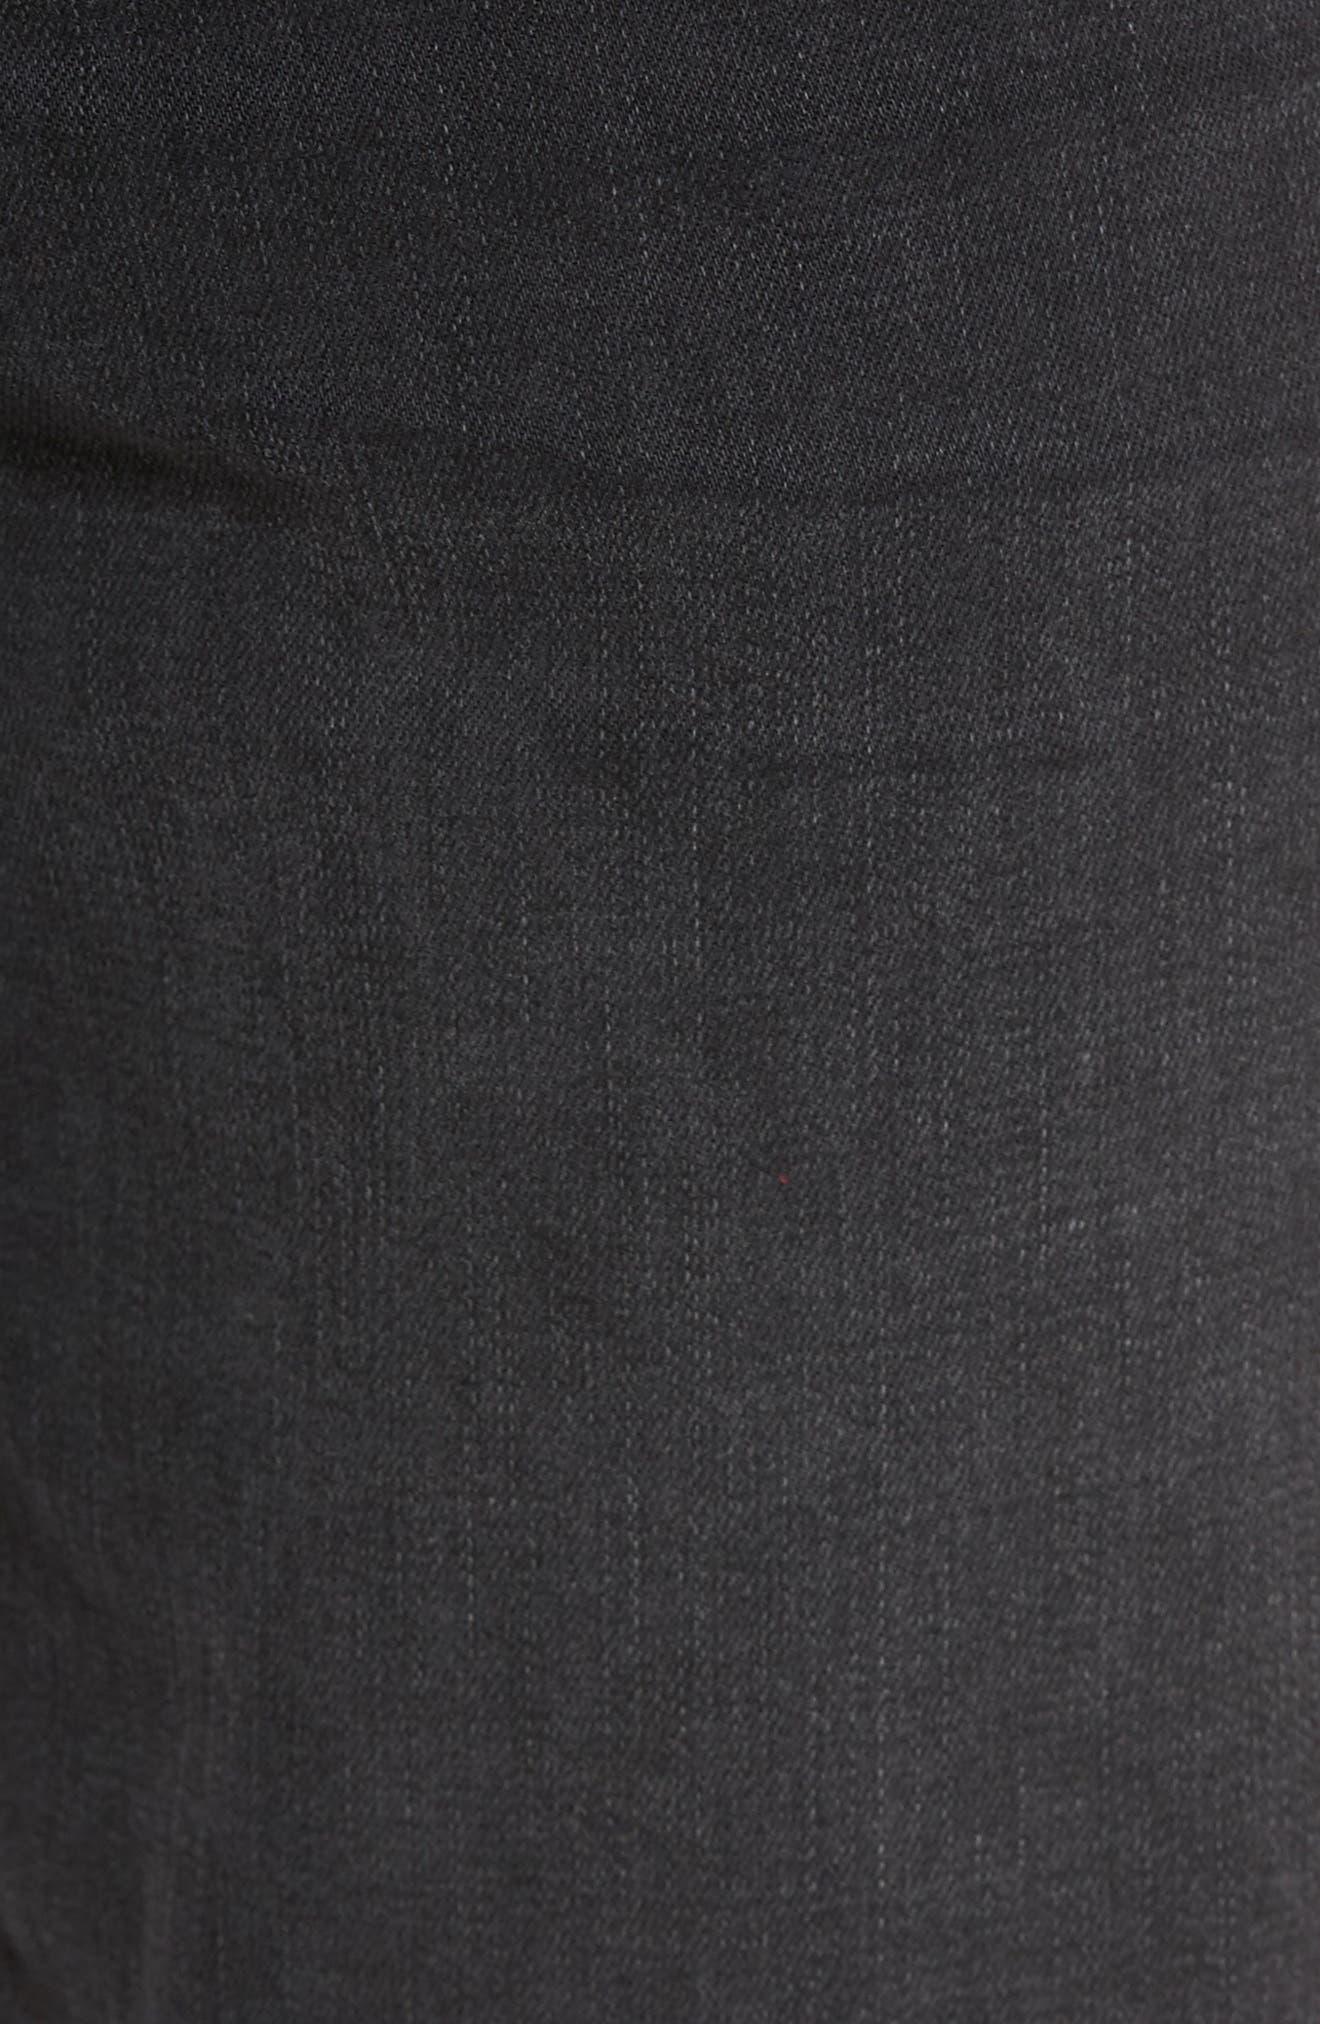 Brixton Slim Straight Fit Jeans,                             Alternate thumbnail 5, color,                             015